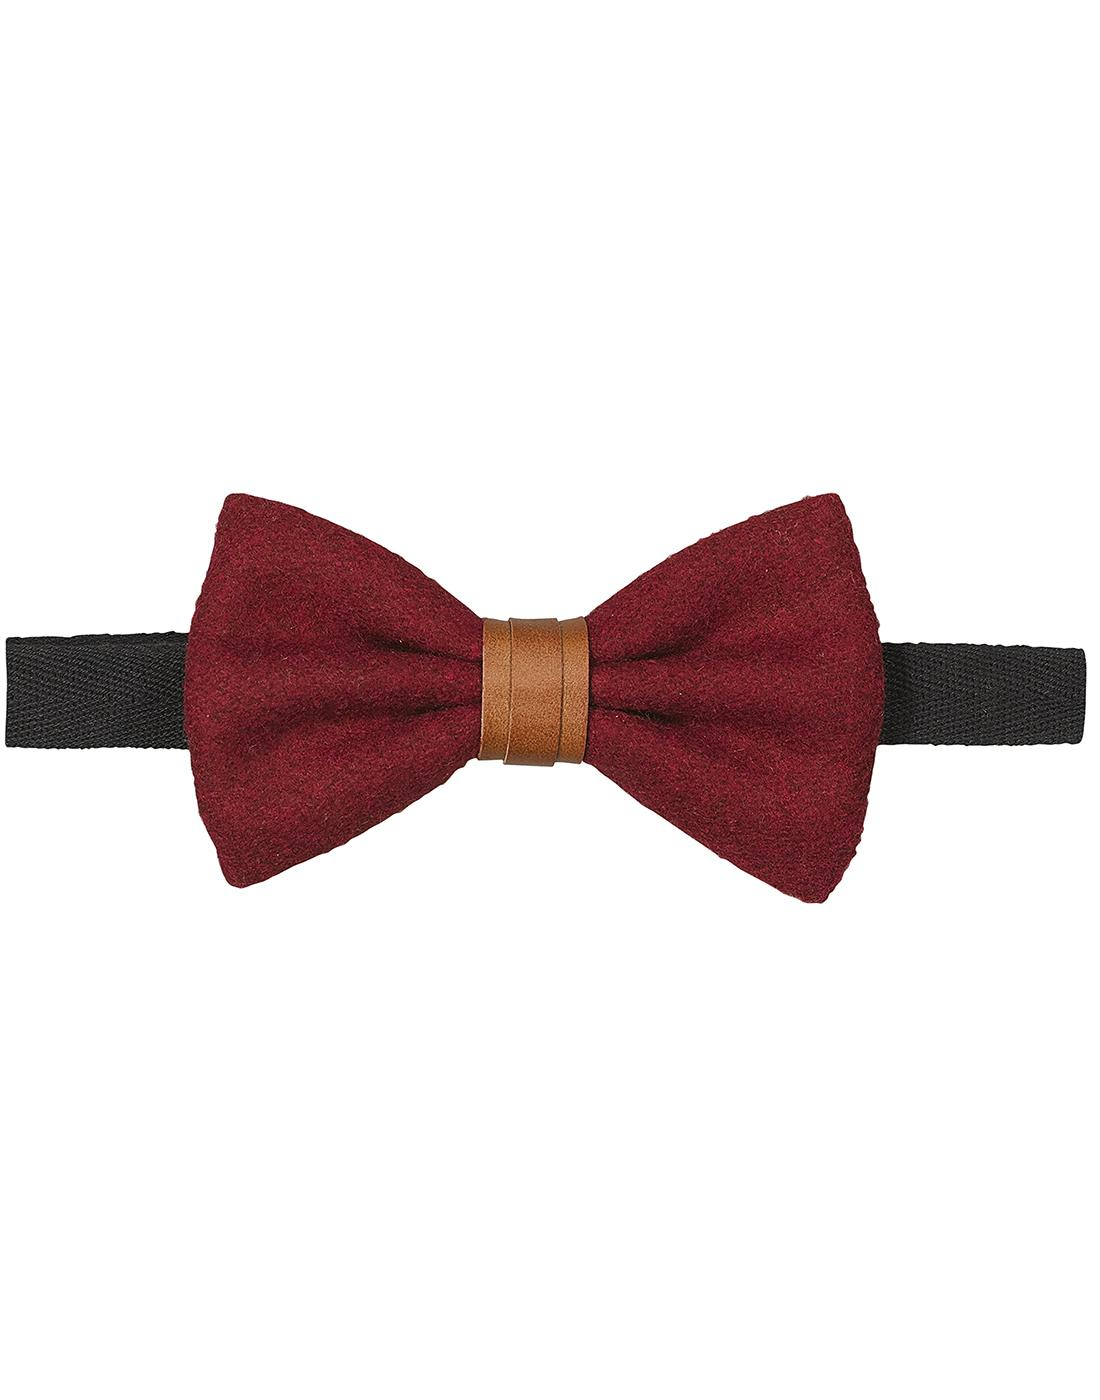 GENTLEMEN'S HARDWARE Vintage Pre-Tied Bow Tie (Bu)